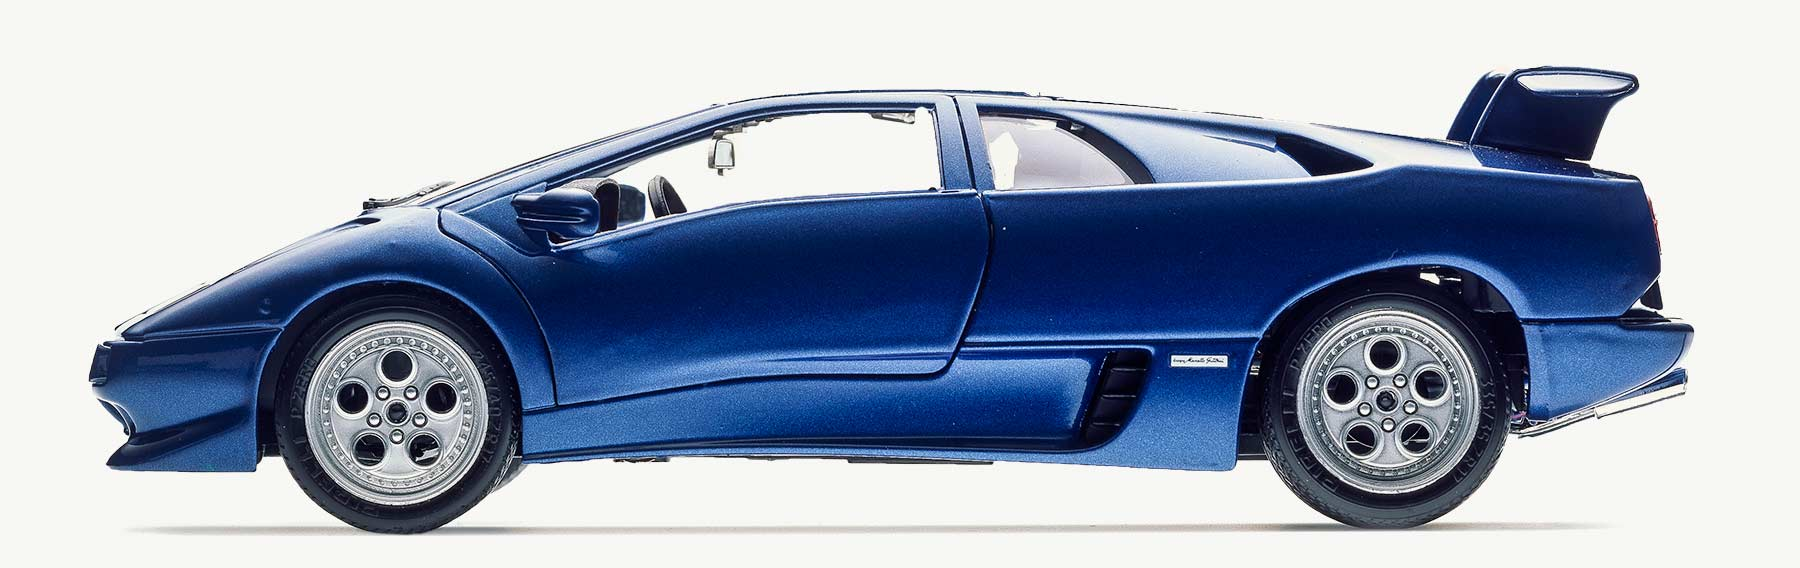 Burago 3018 Lamborghini Metal Blue Diablo